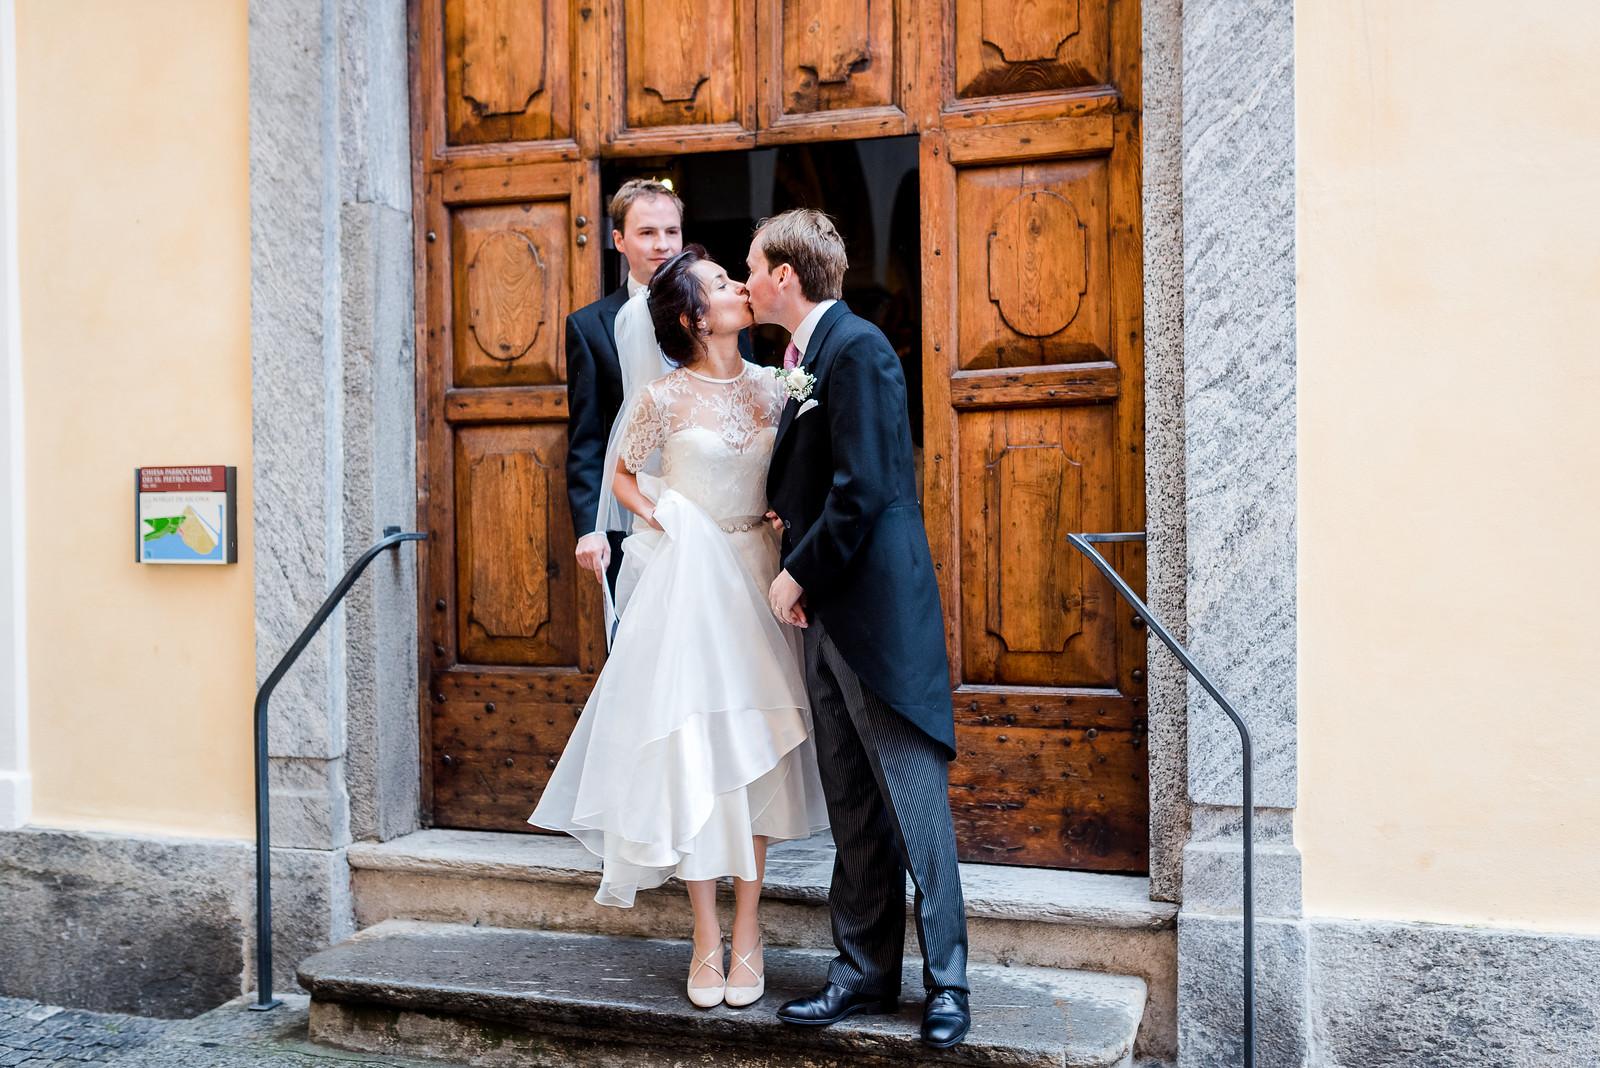 Beautiful bride Antoinette wore a wedding dress by Halfpenny London1